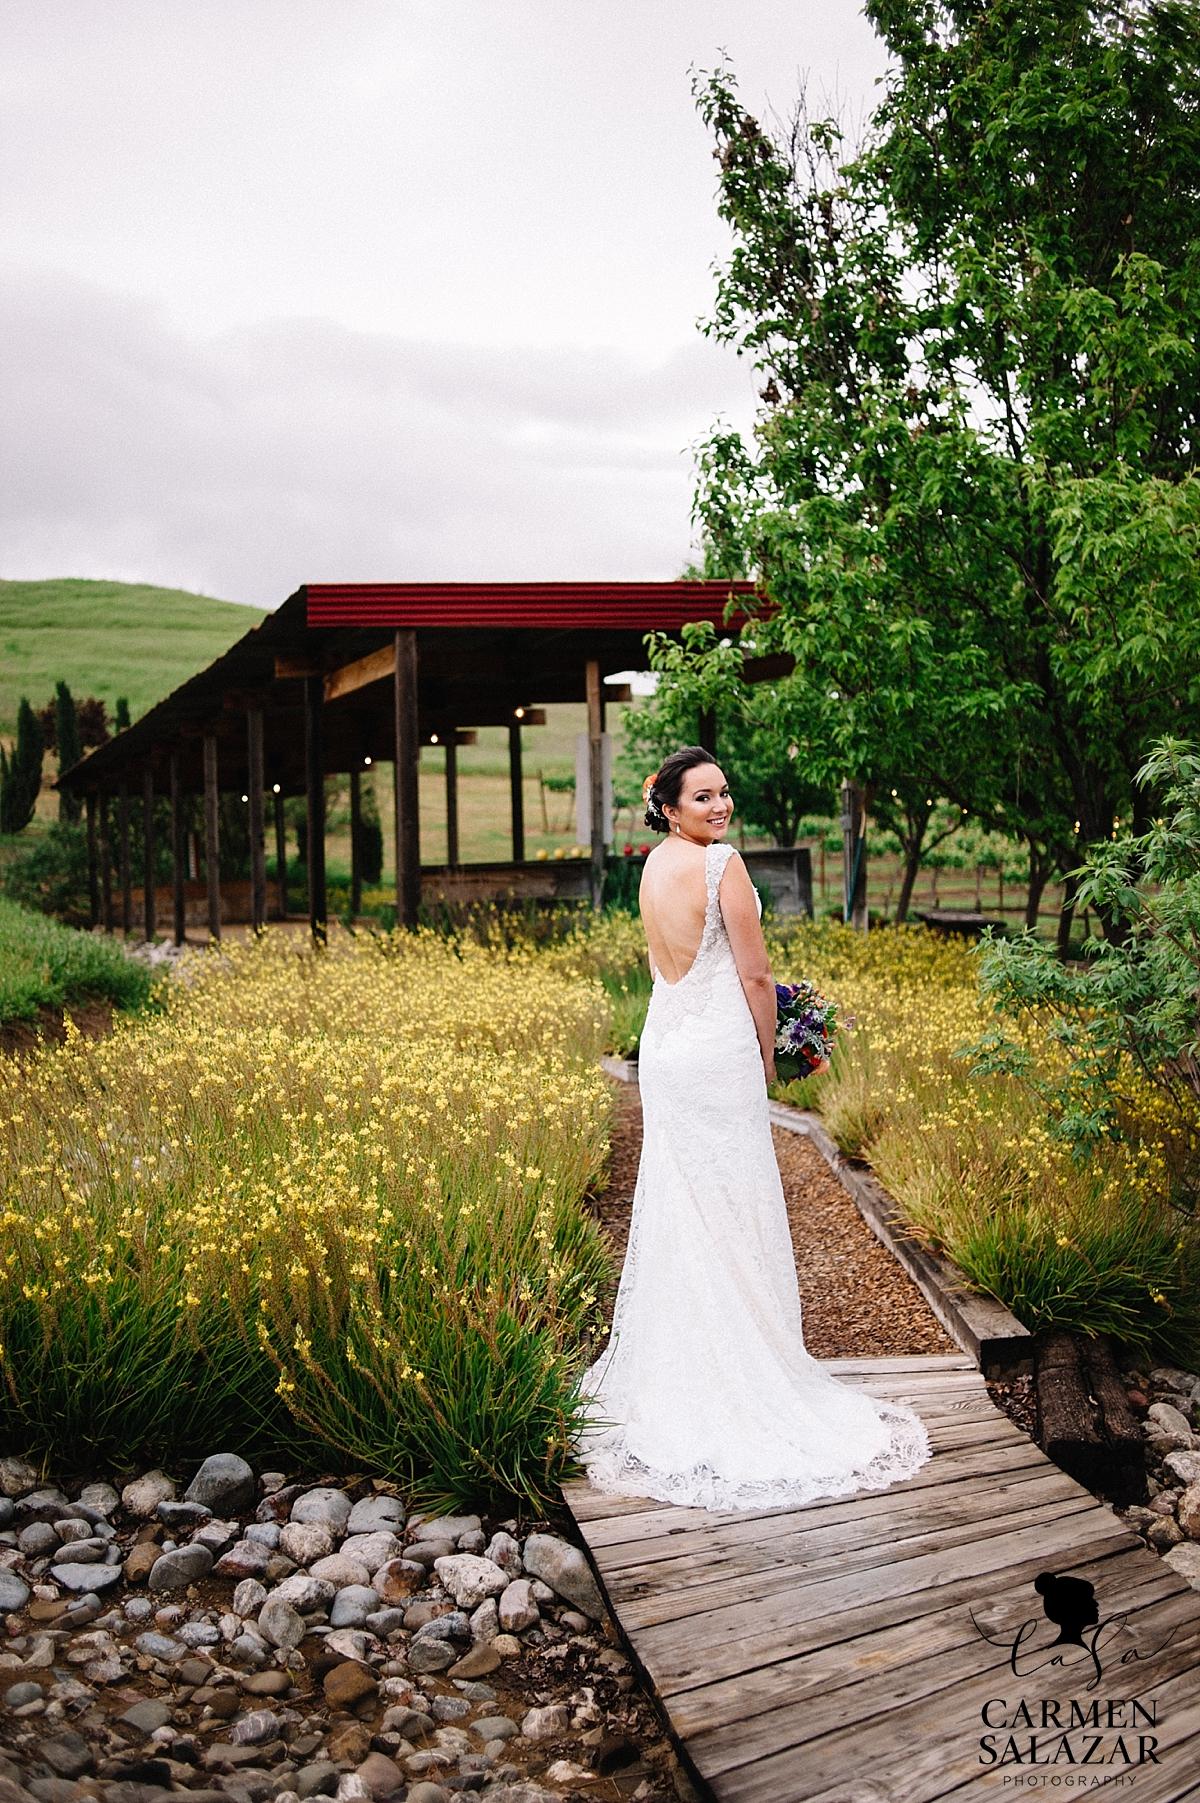 Stunning Taber Ranch bridal portraits - Carmen Salazar